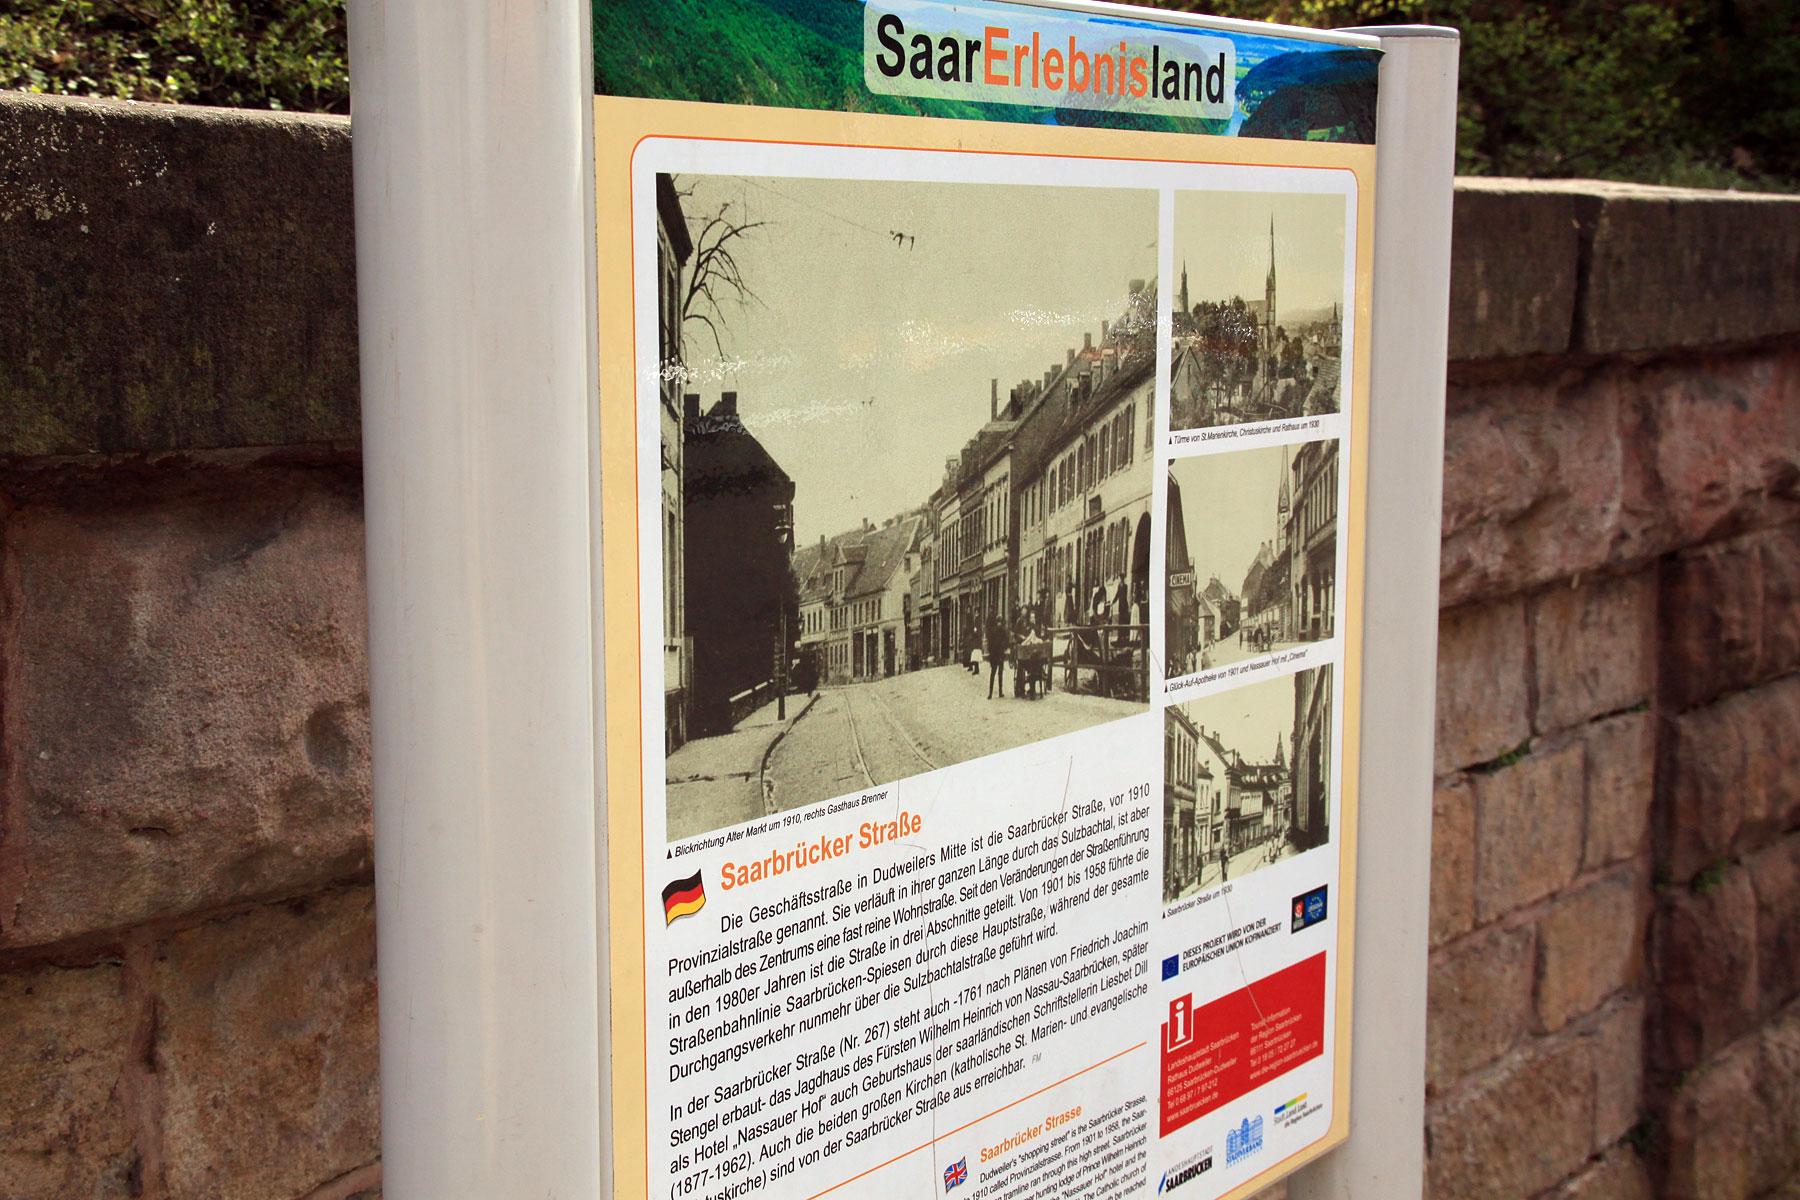 Hinweisschilder zur Stadtgeschichte